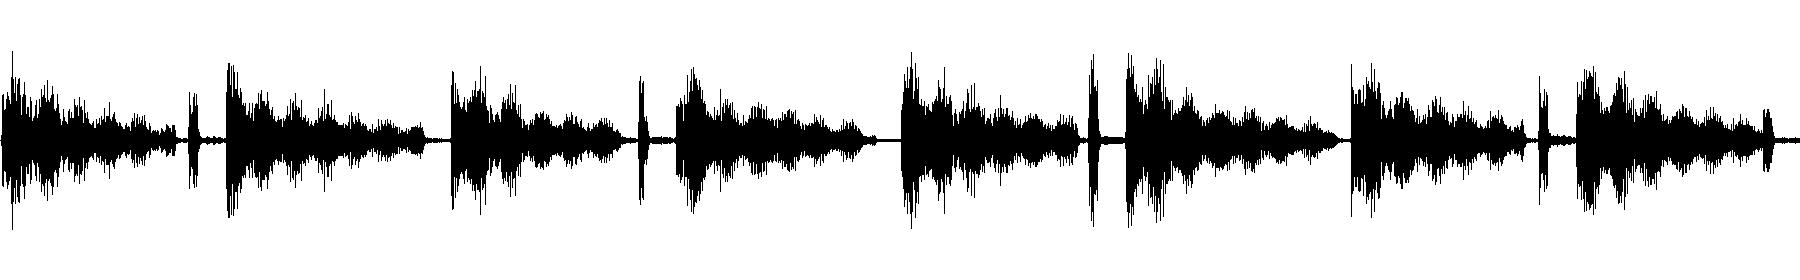 hm 120 d epiano43